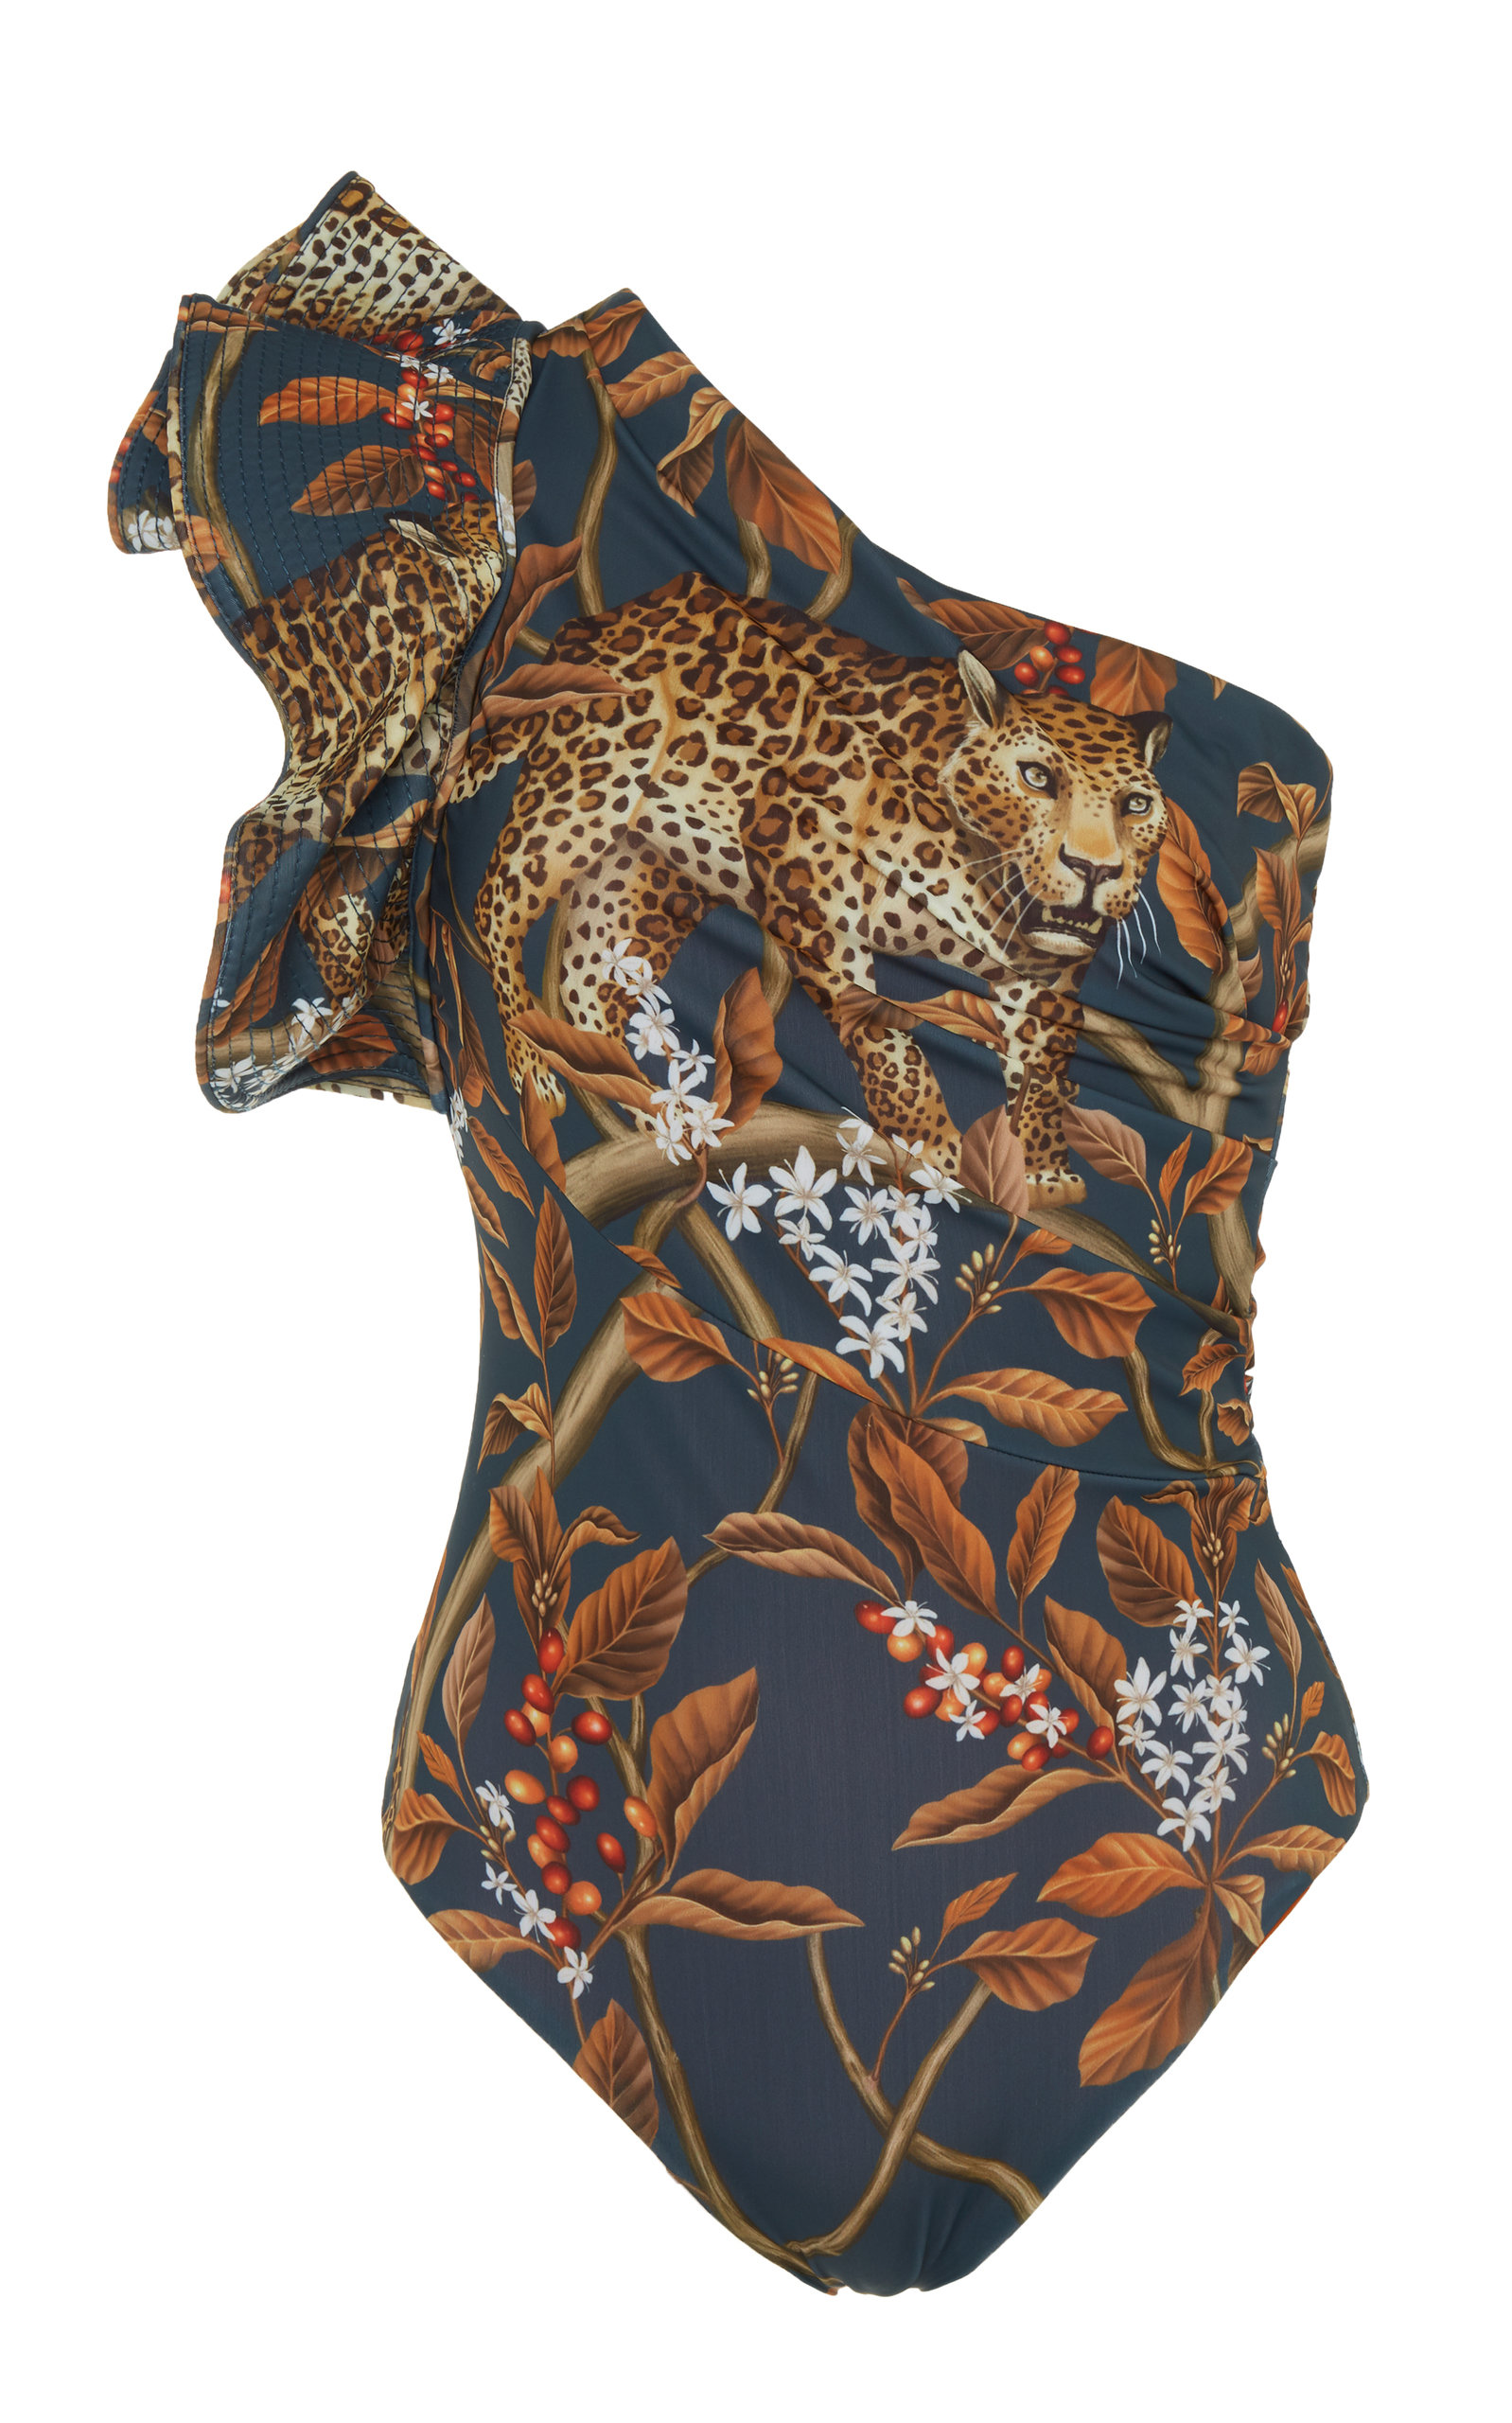 918480dcf5 Johanna OrtizIndonesian Desire Printed One-Shoulder One-Piece Swimsuit.  CLOSE. Loading